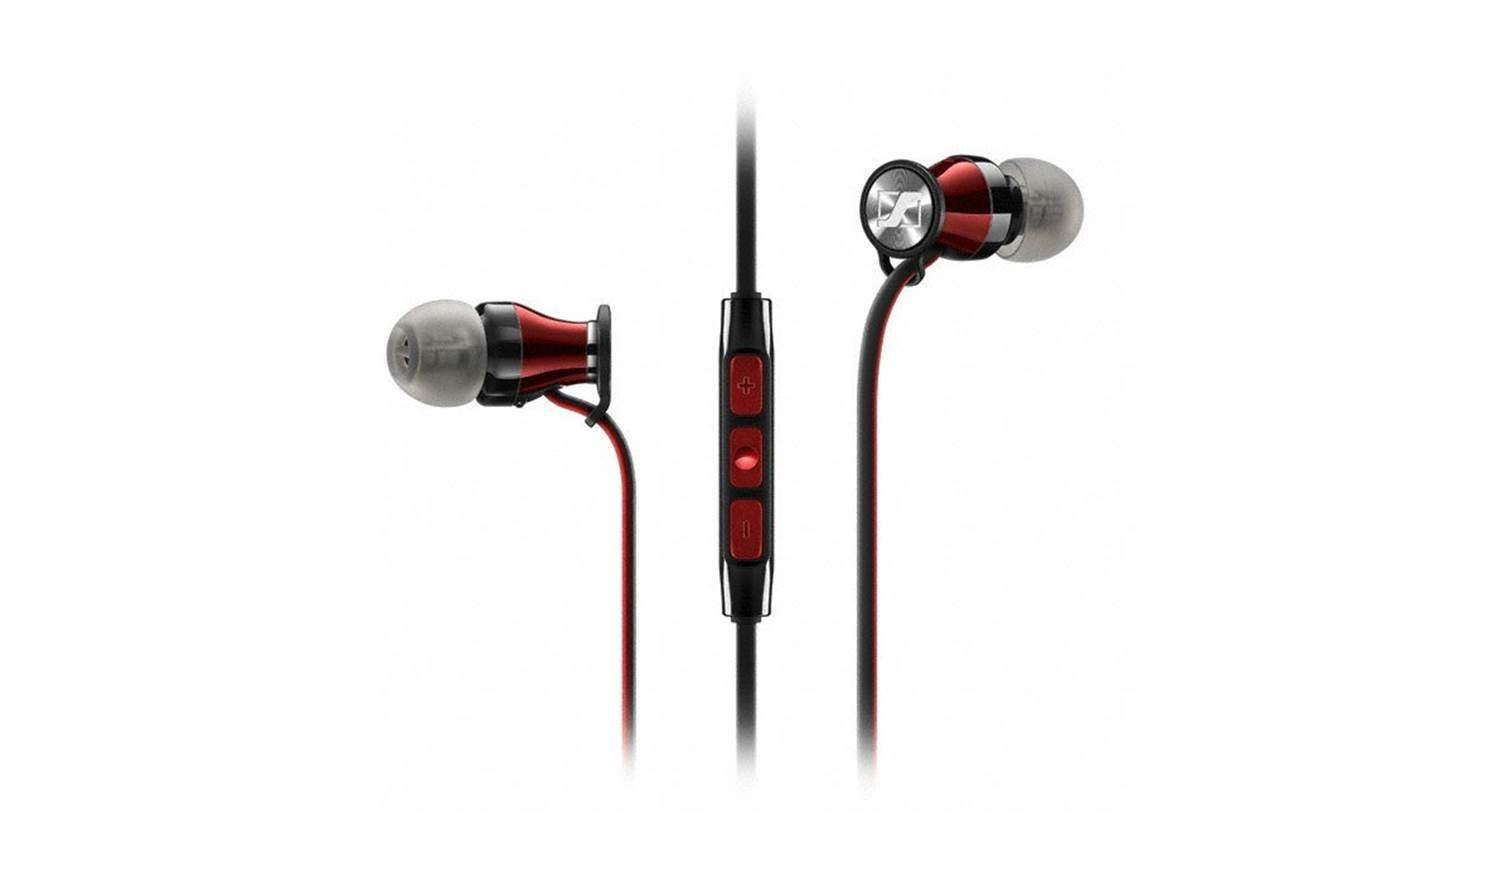 Sennheiser Momentum (Android) Headphones 506244 - Red